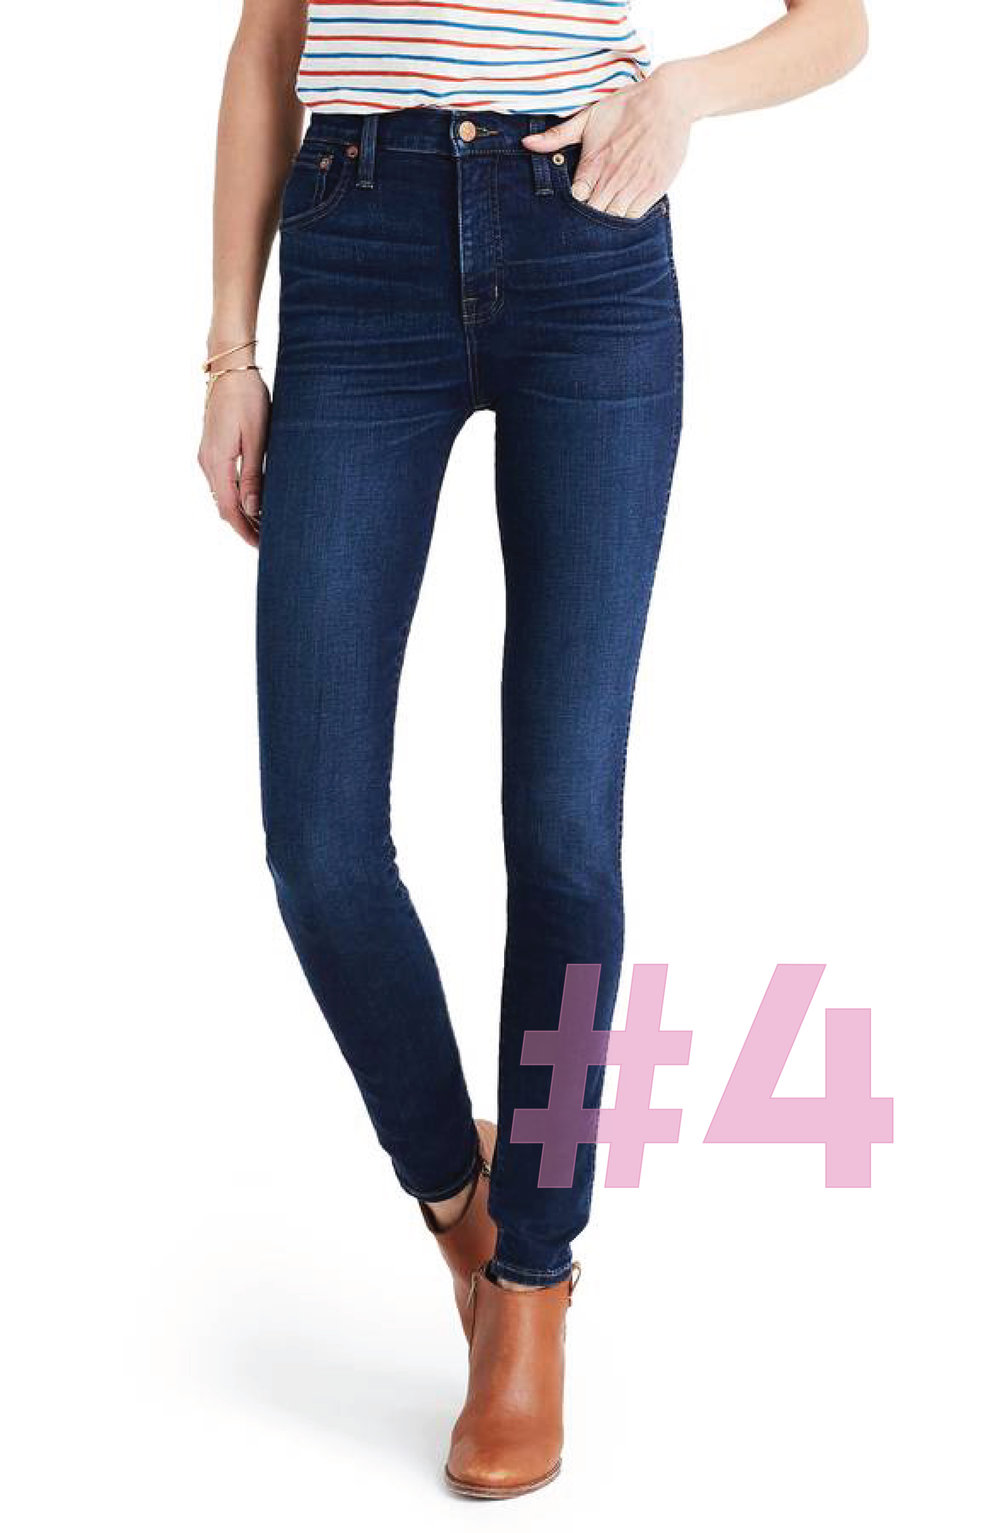 Jeans-4.jpg